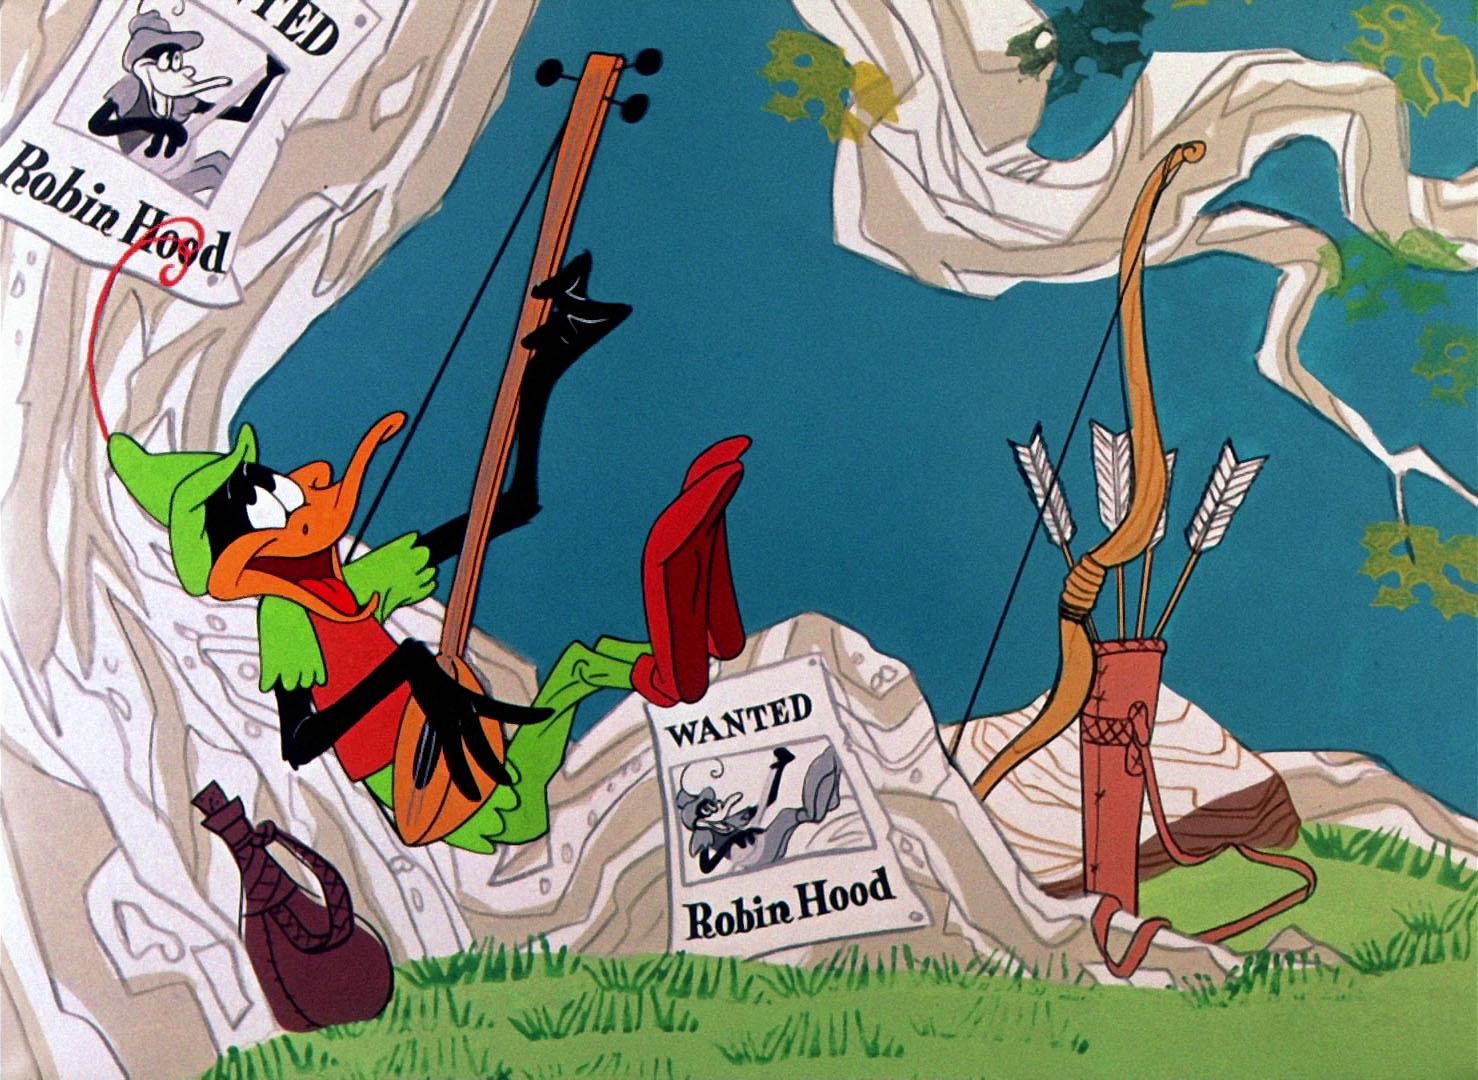 robin-hood-daffy-c2a9-warner-brothers